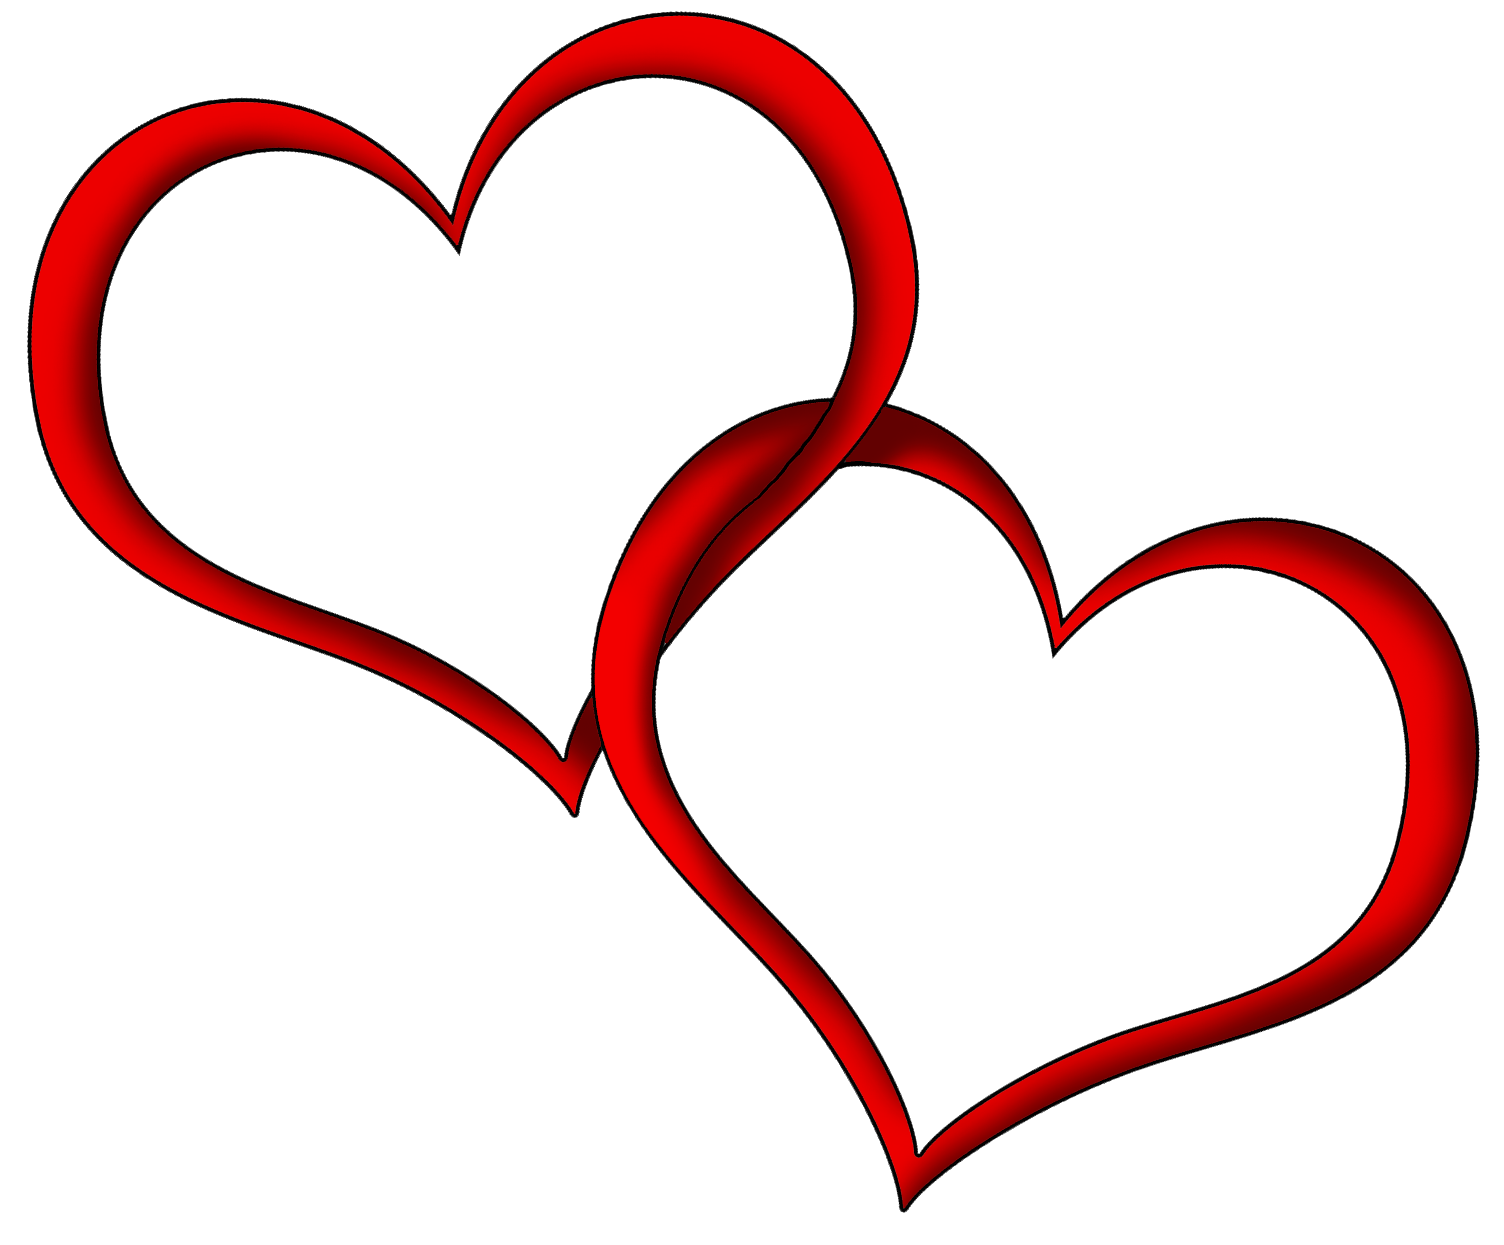 Hearts Heart Clipart-Hearts heart clipart-13